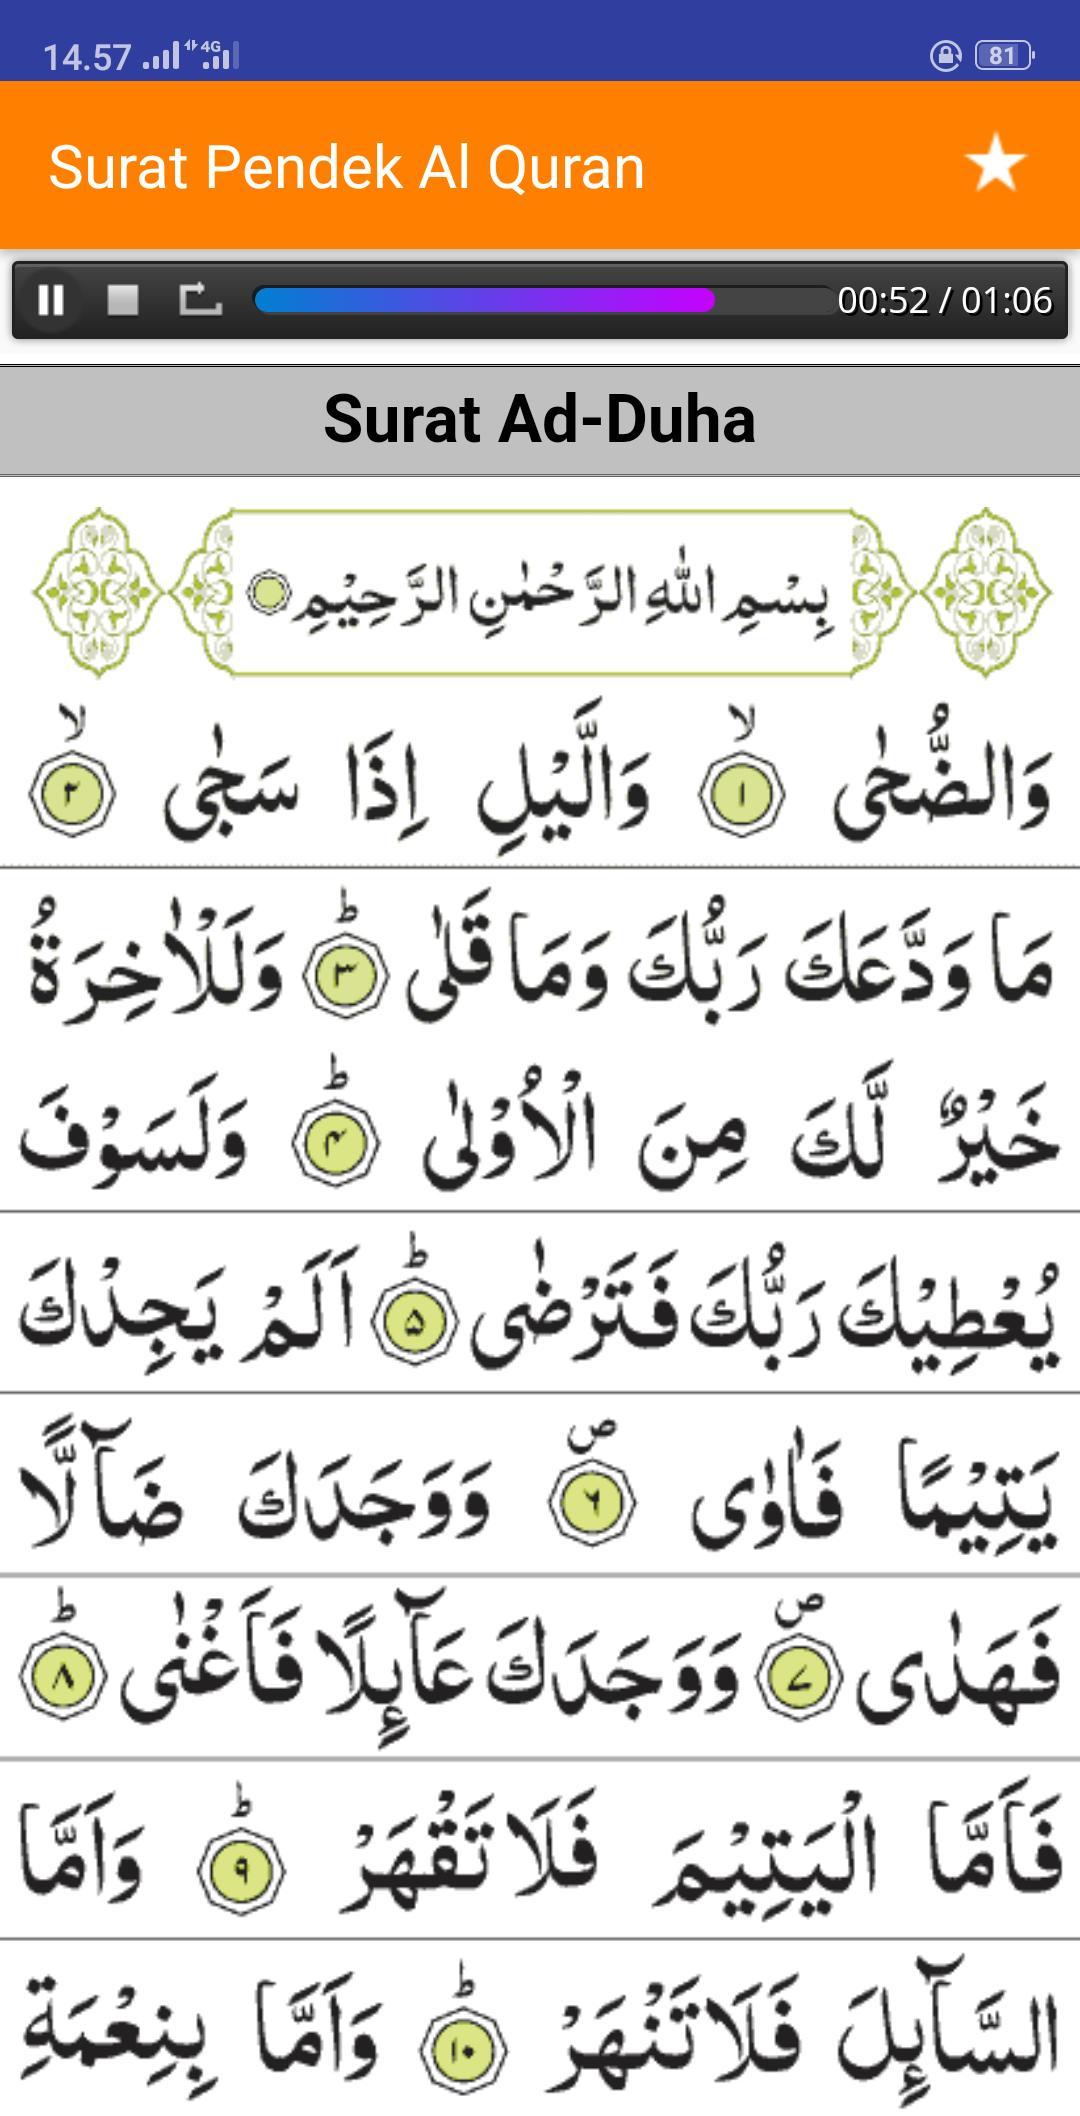 Surat Surat Pendek Al Quran Juz 30 Mp3 Offline For Android